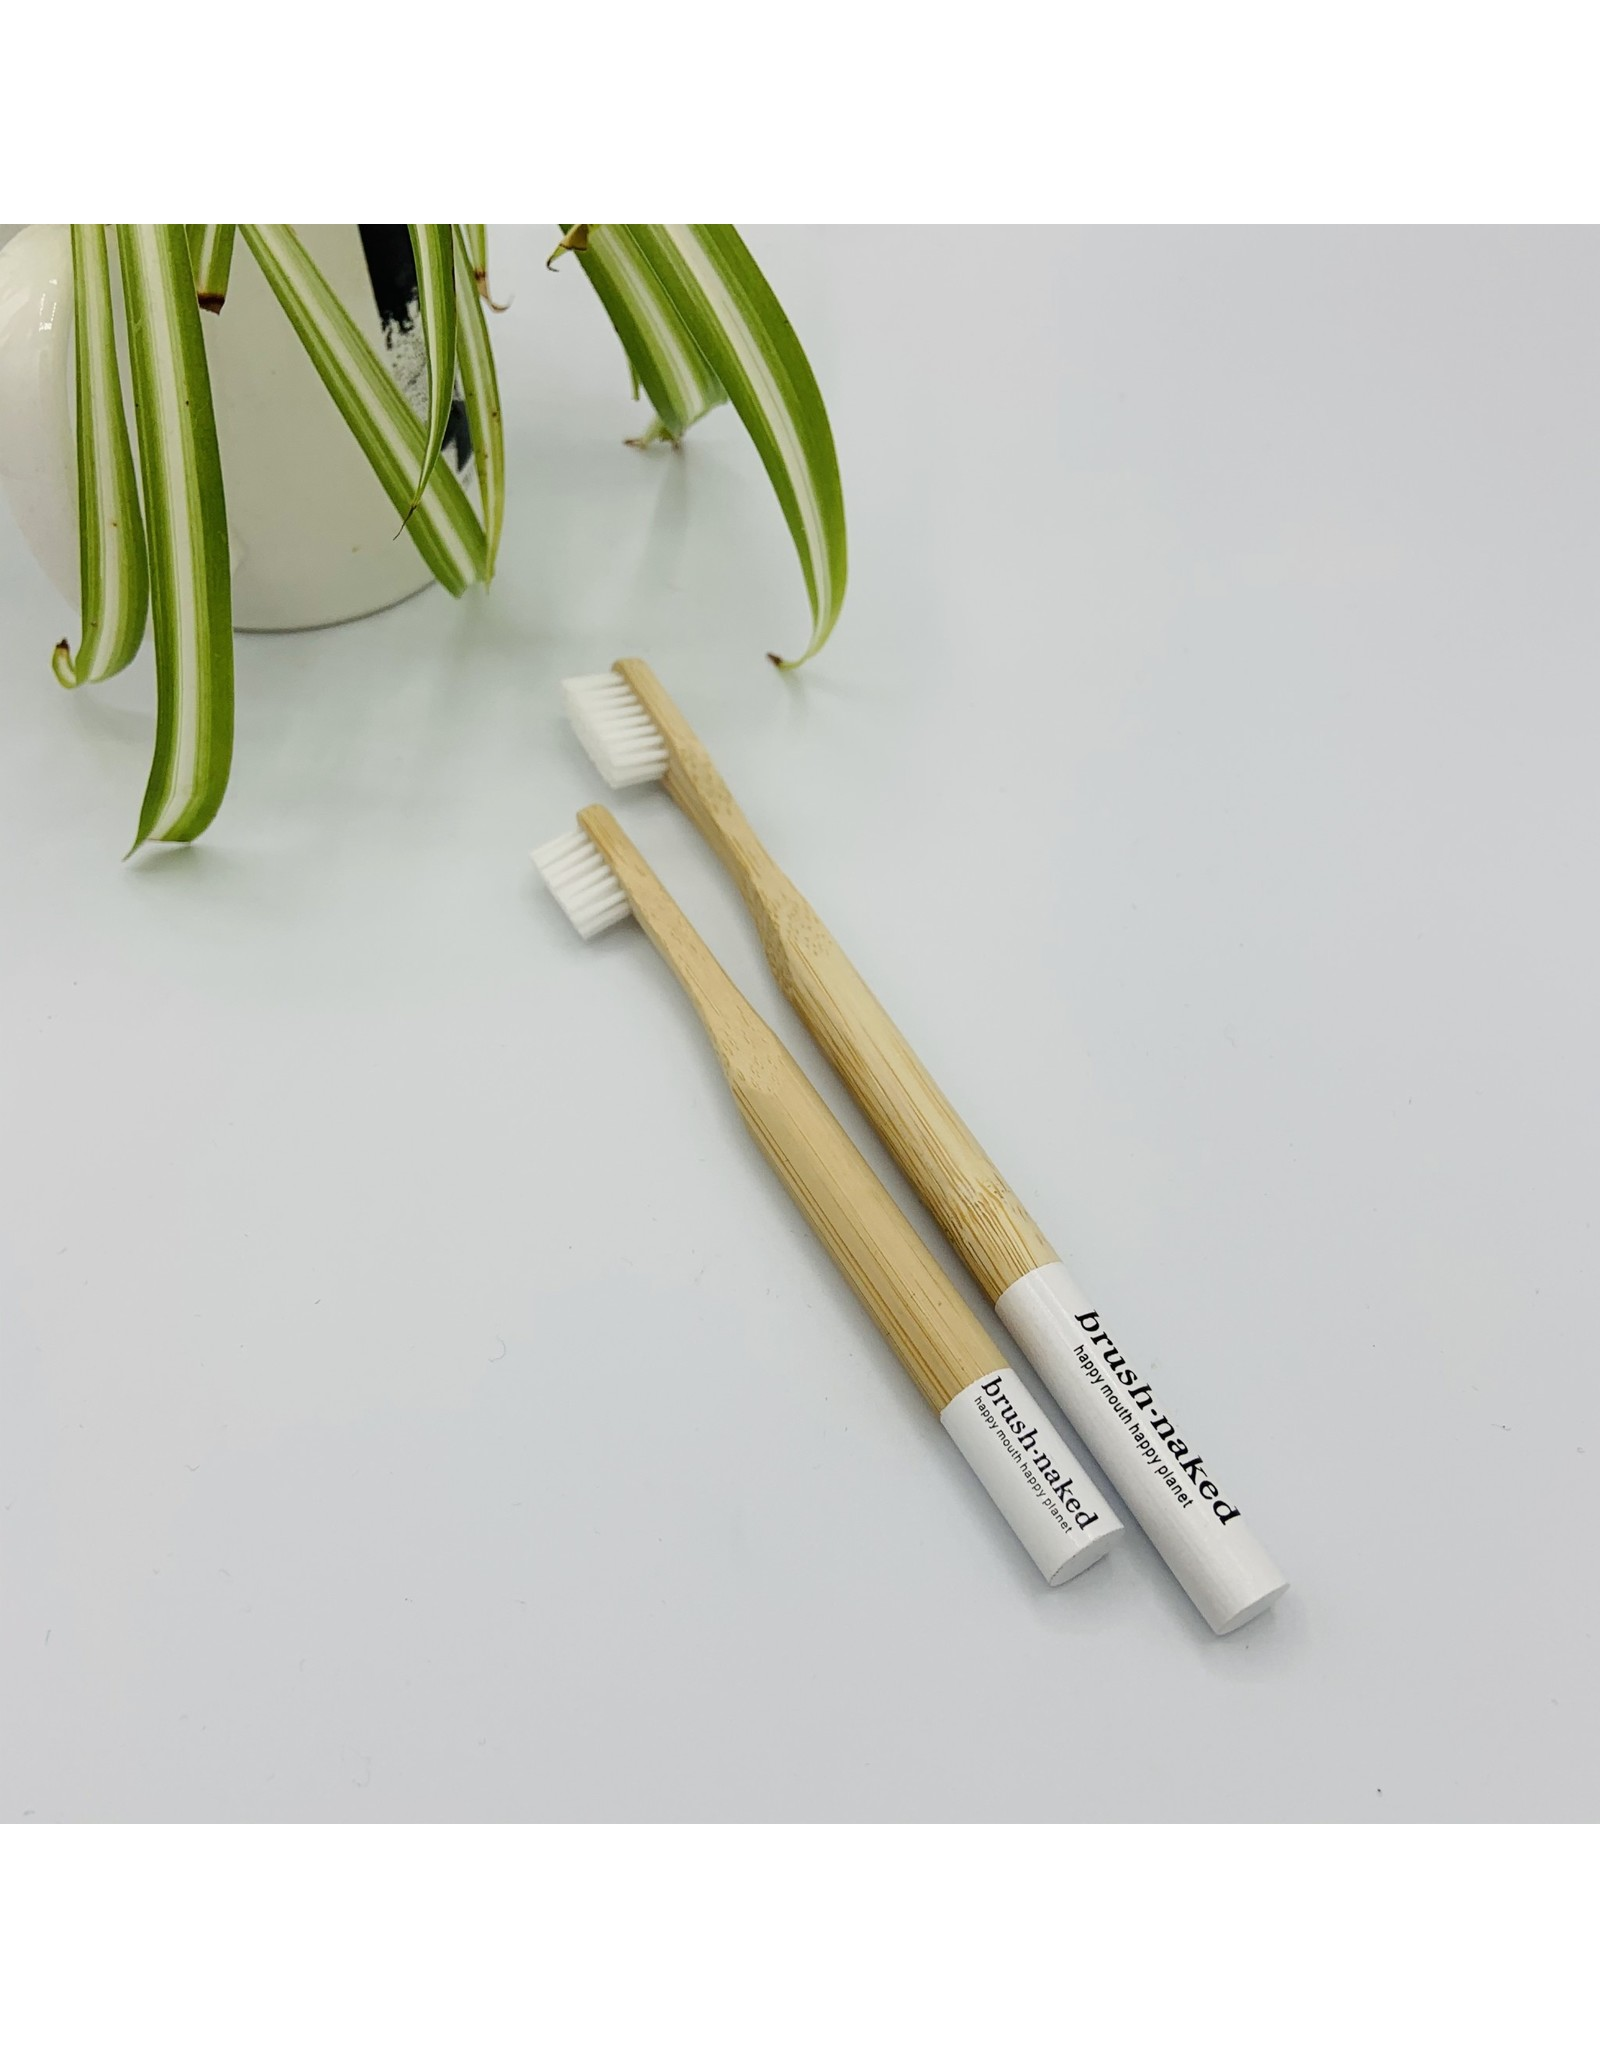 Brush Naked Bamboo ToothBrush, Child